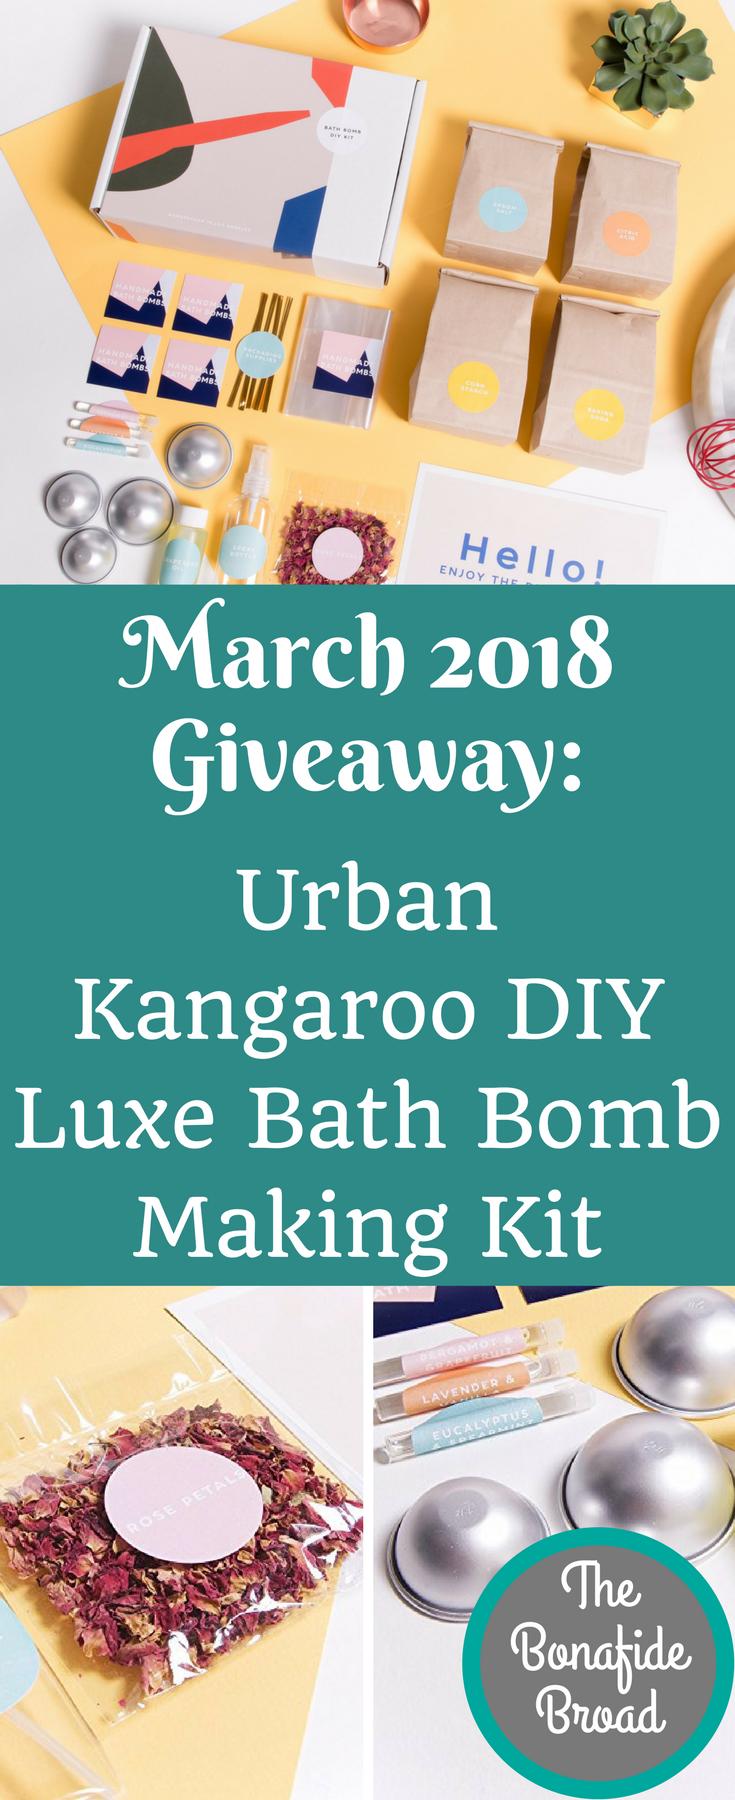 March 2018 giveawayurban kangaroo do it yourself luxe bath bomb kit solutioingenieria Image collections